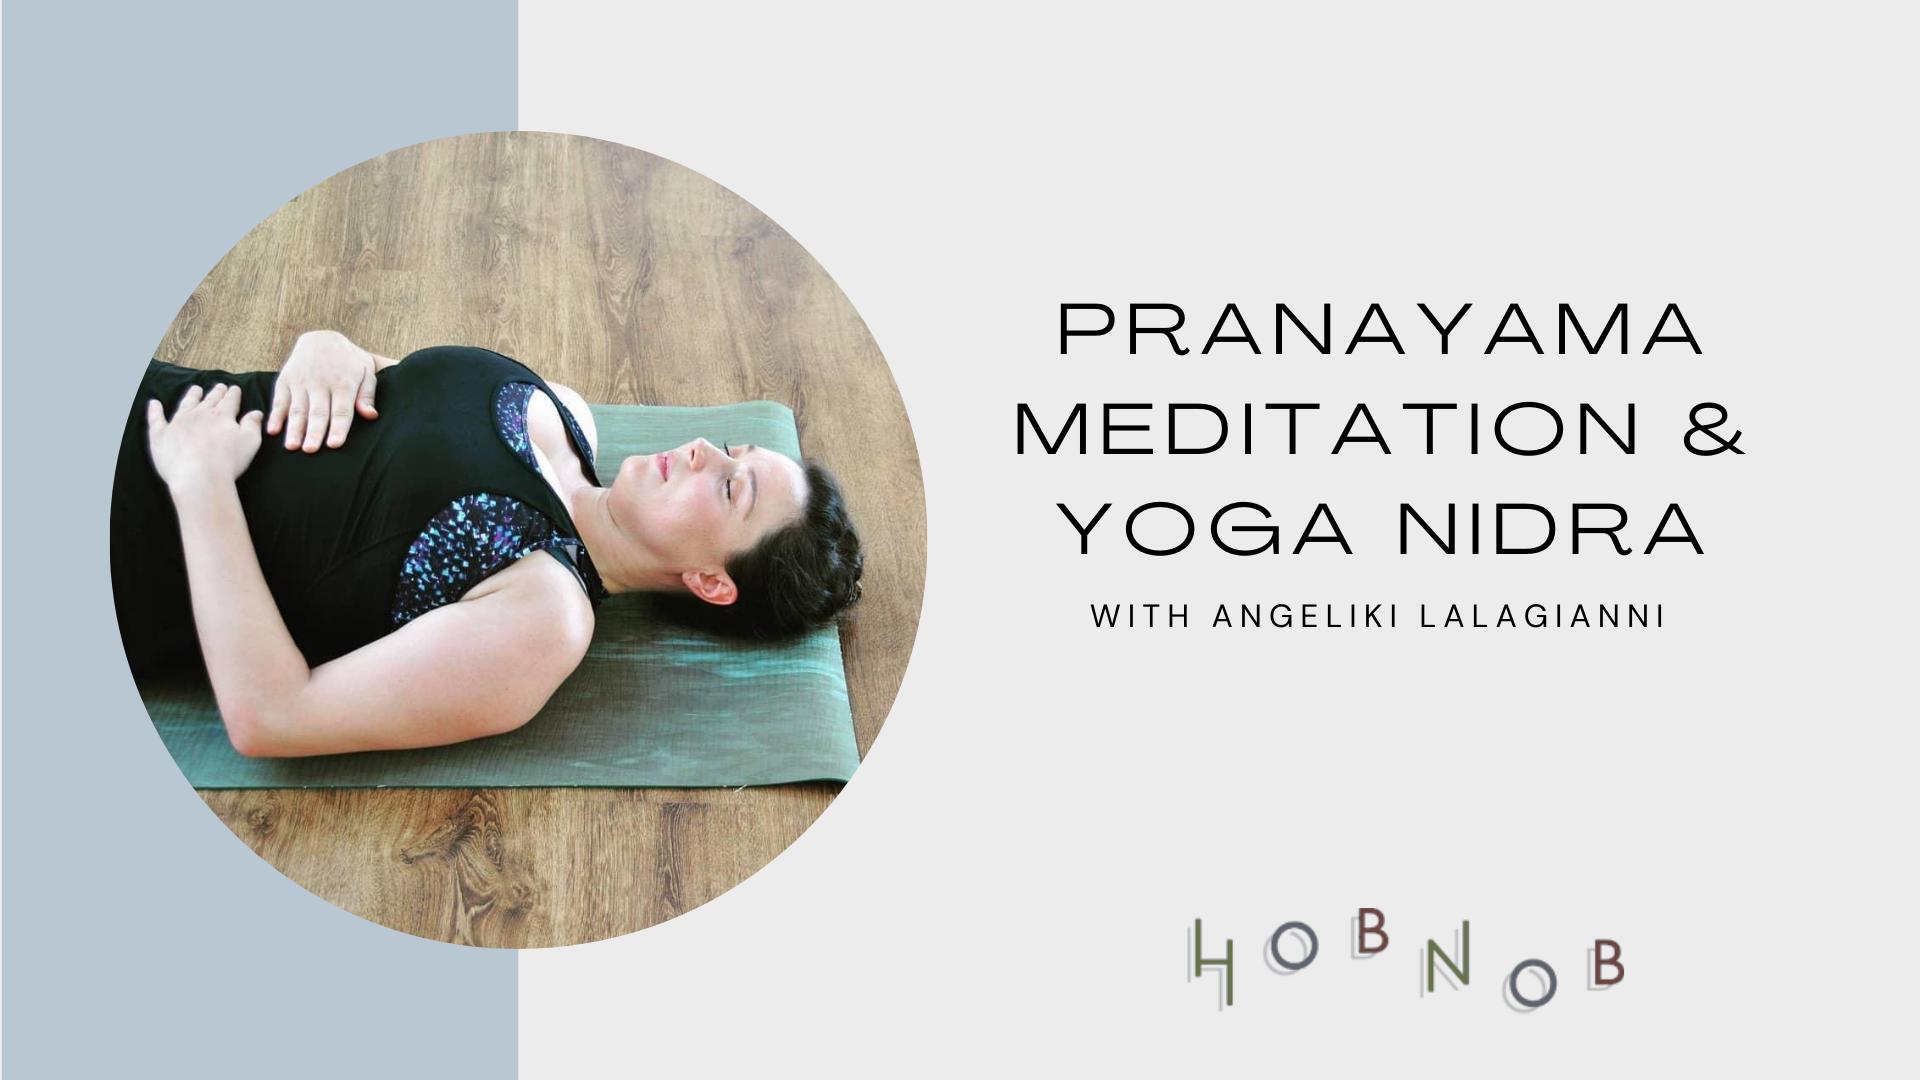 Pranayama, meditation & yoga nidra @ Hobnob